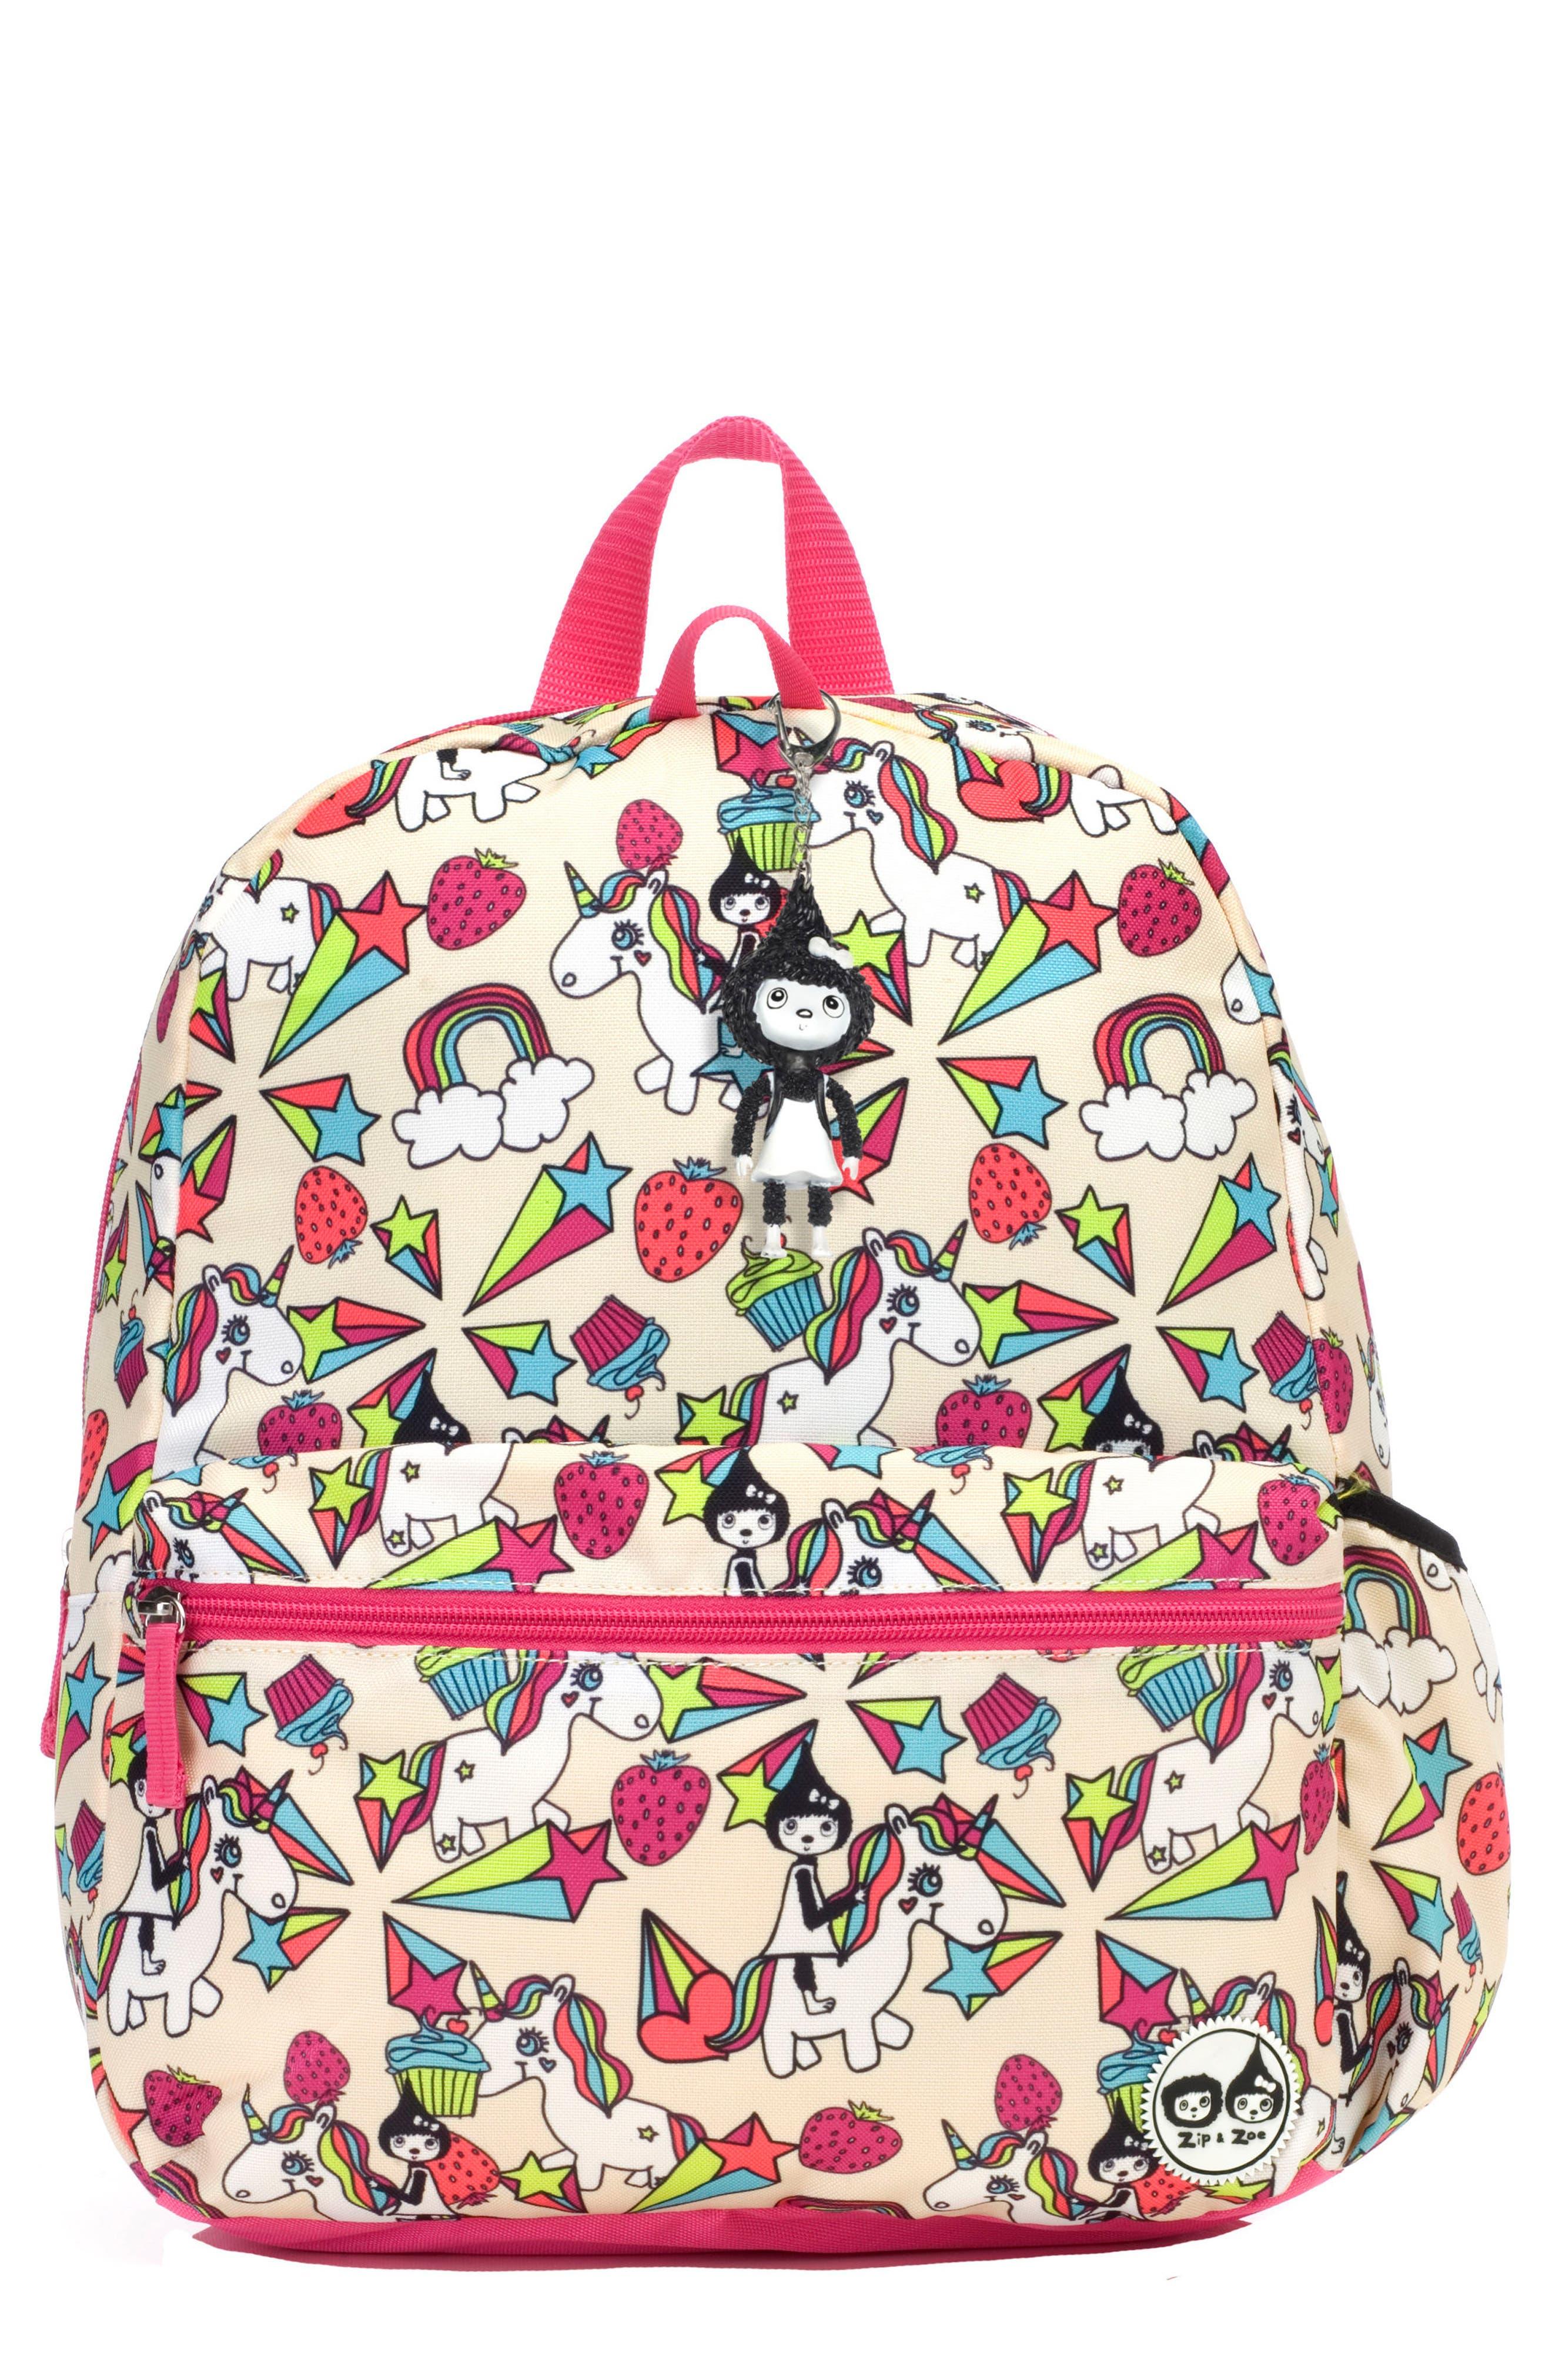 Alternate Image 1 Selected - Babymel Zip & Zoe Unicorn Junior Backpack (Kids)